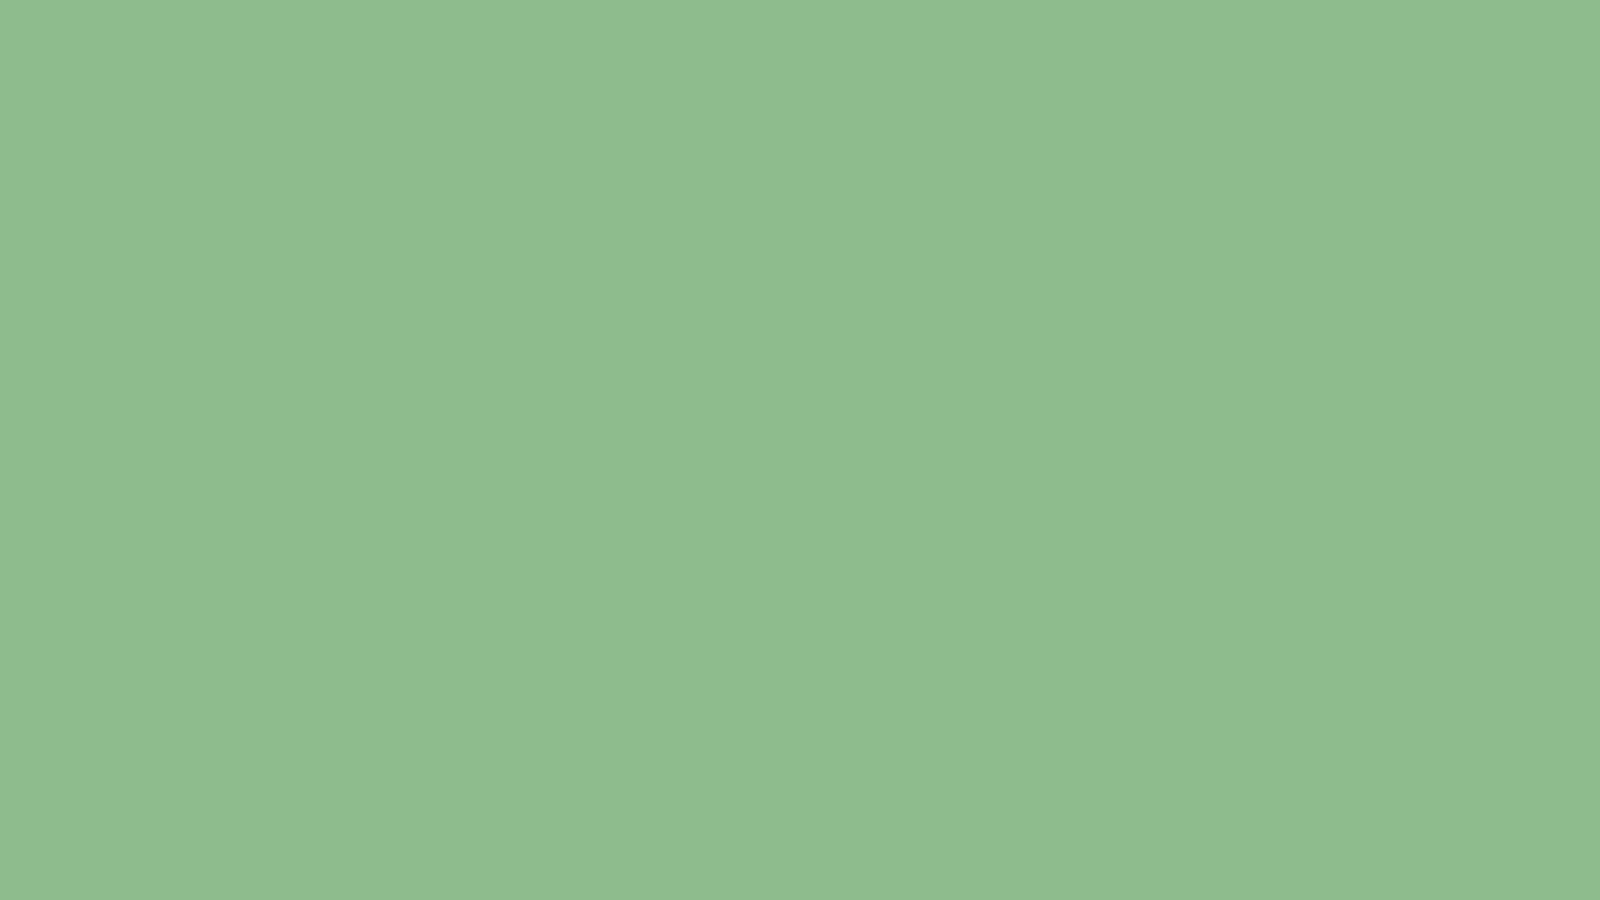 1600x900 Dark Sea Green Solid Color Background